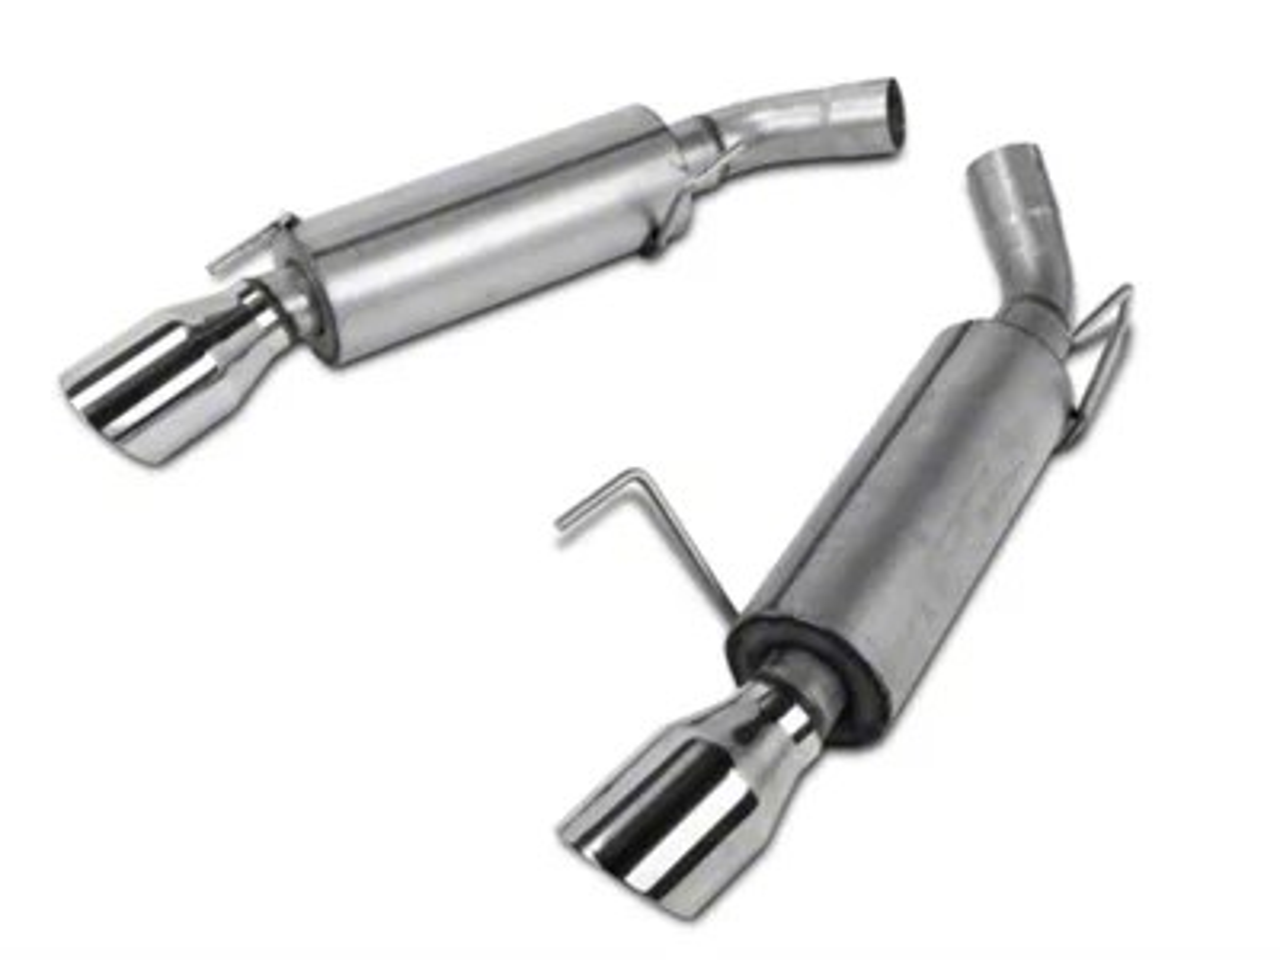 mbrp installer series axle back exhaust 05 10 gt